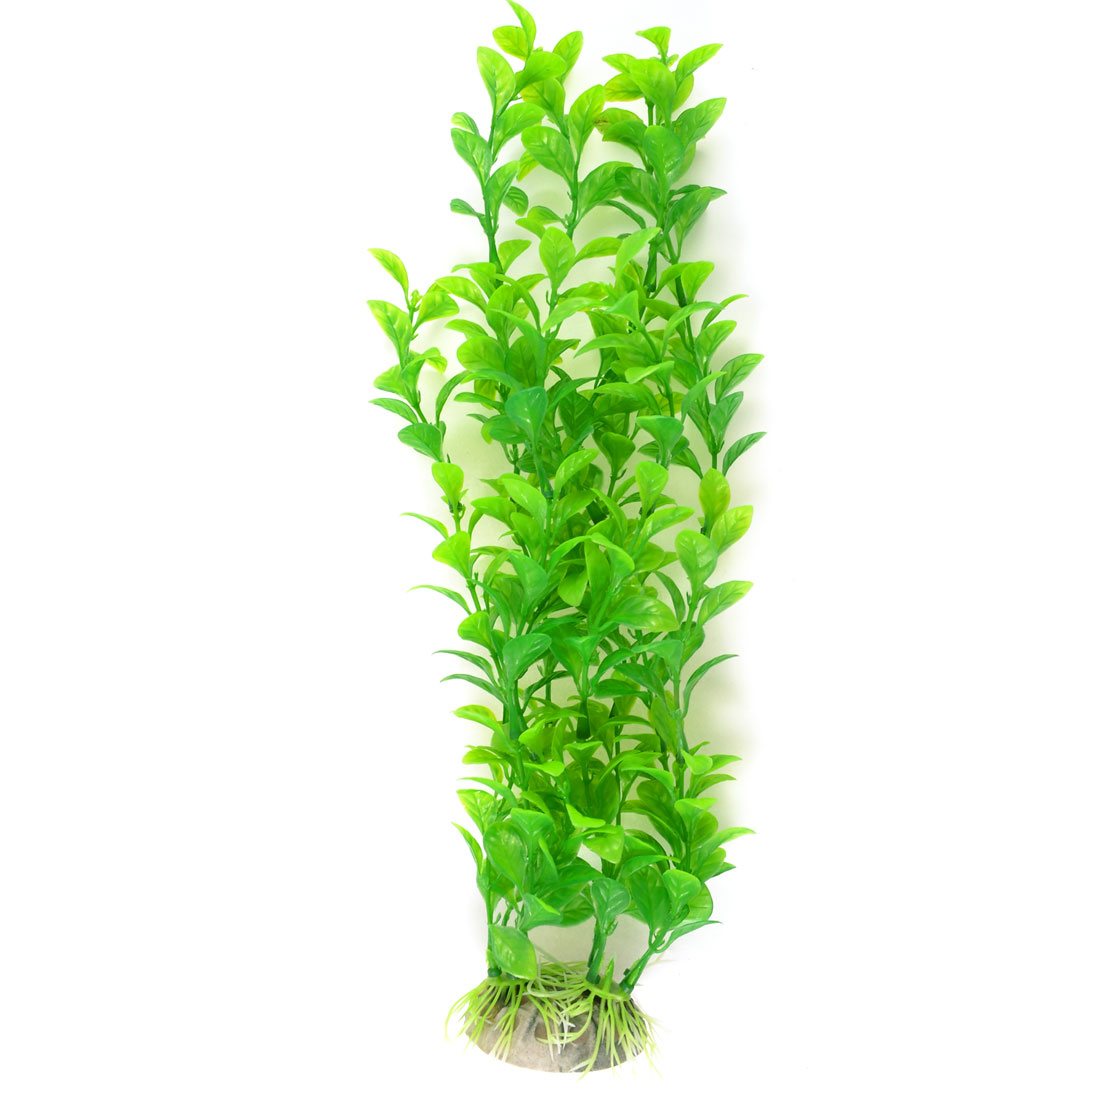 "Aquarium Landscaping Ornament Plastic Water Plant Grass Green 12.6"" High"